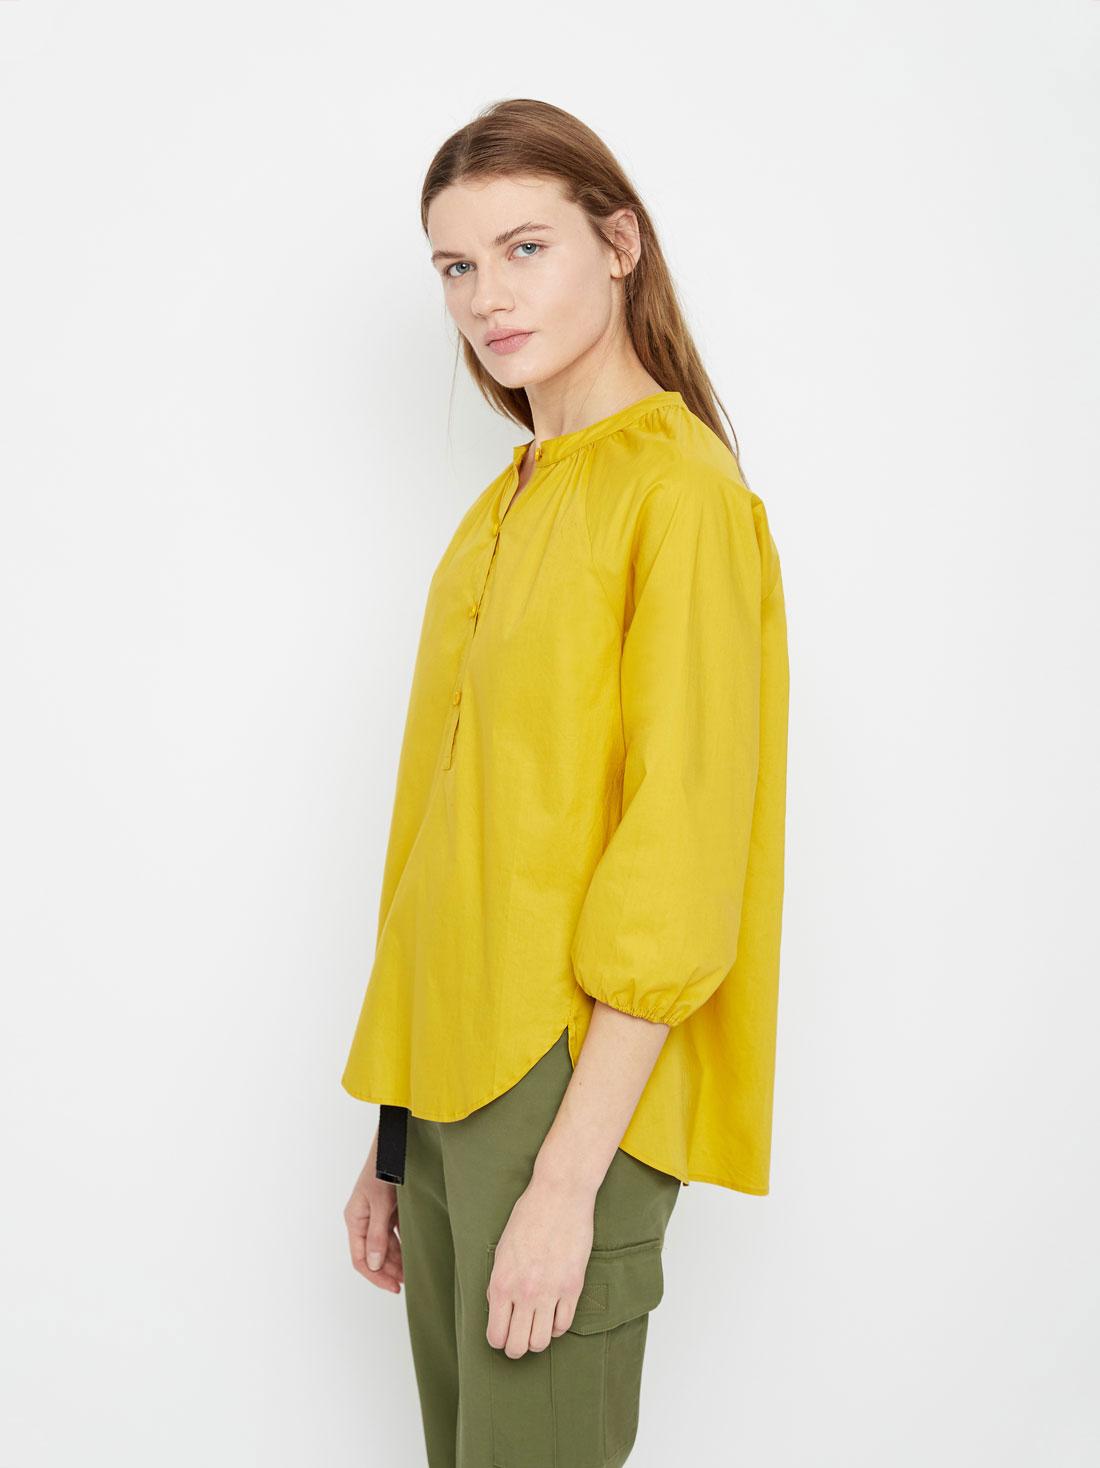 902e4895d0e Ассиметричная блузка из хлопка желтый цвет - Рубашки и блузки LIME